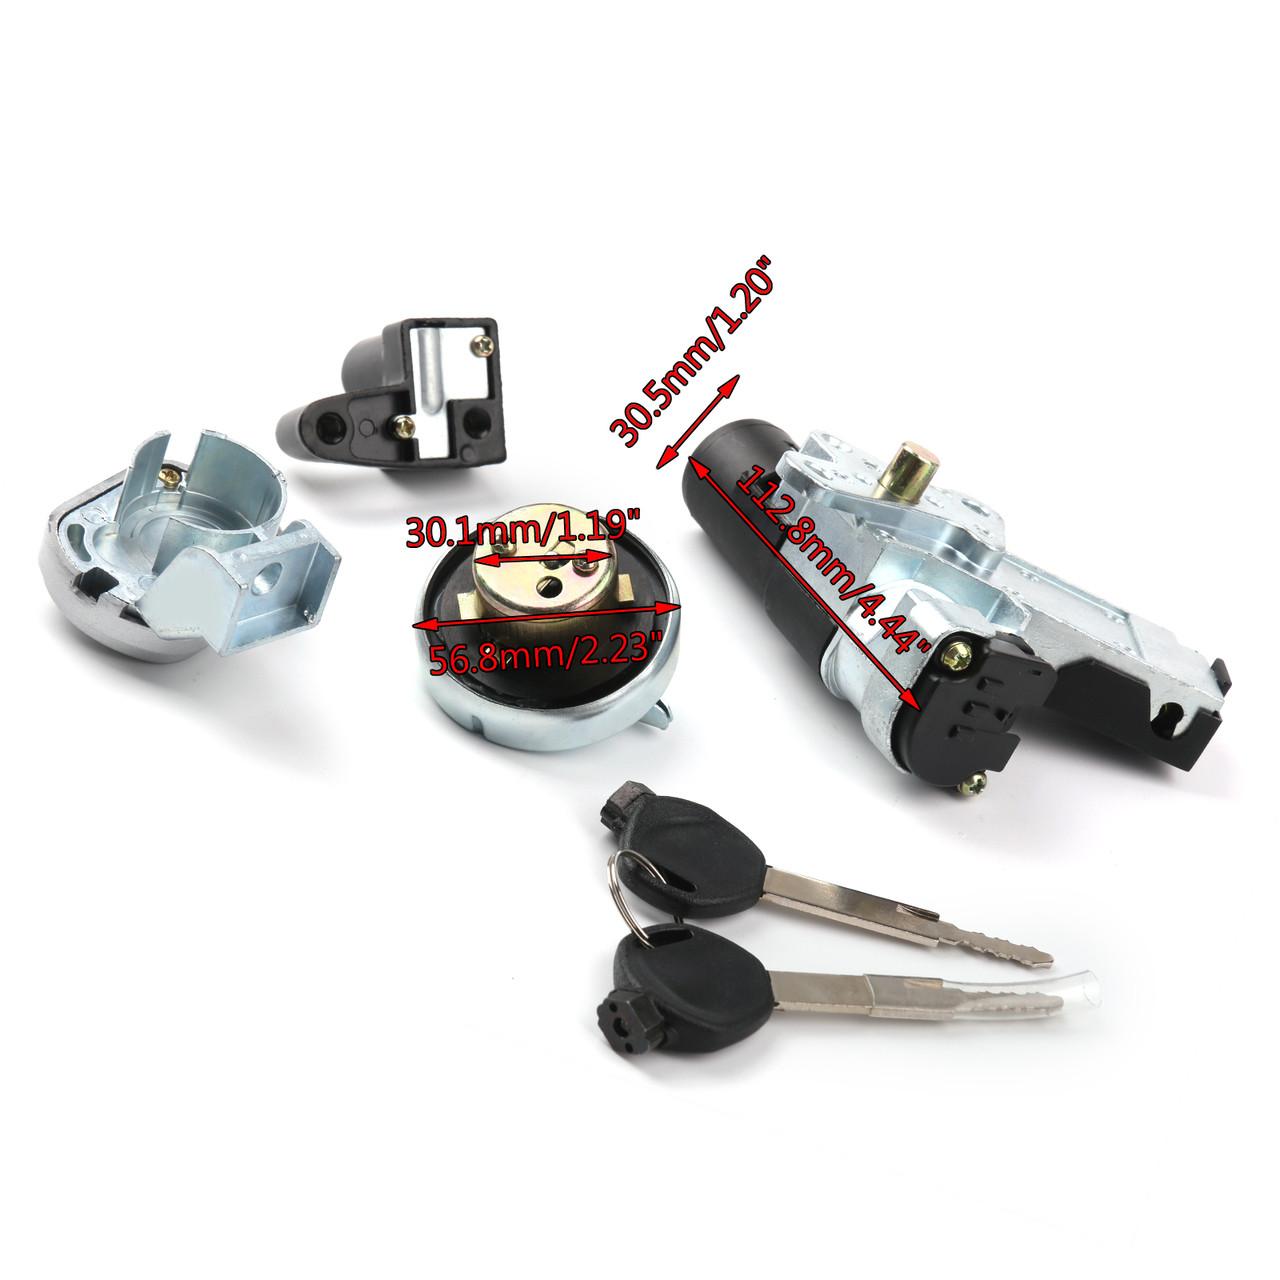 gnition Switch Fuel Gas Cap Seat Lock Key Kit For Honda NPS50 Ruckus 50 03-19